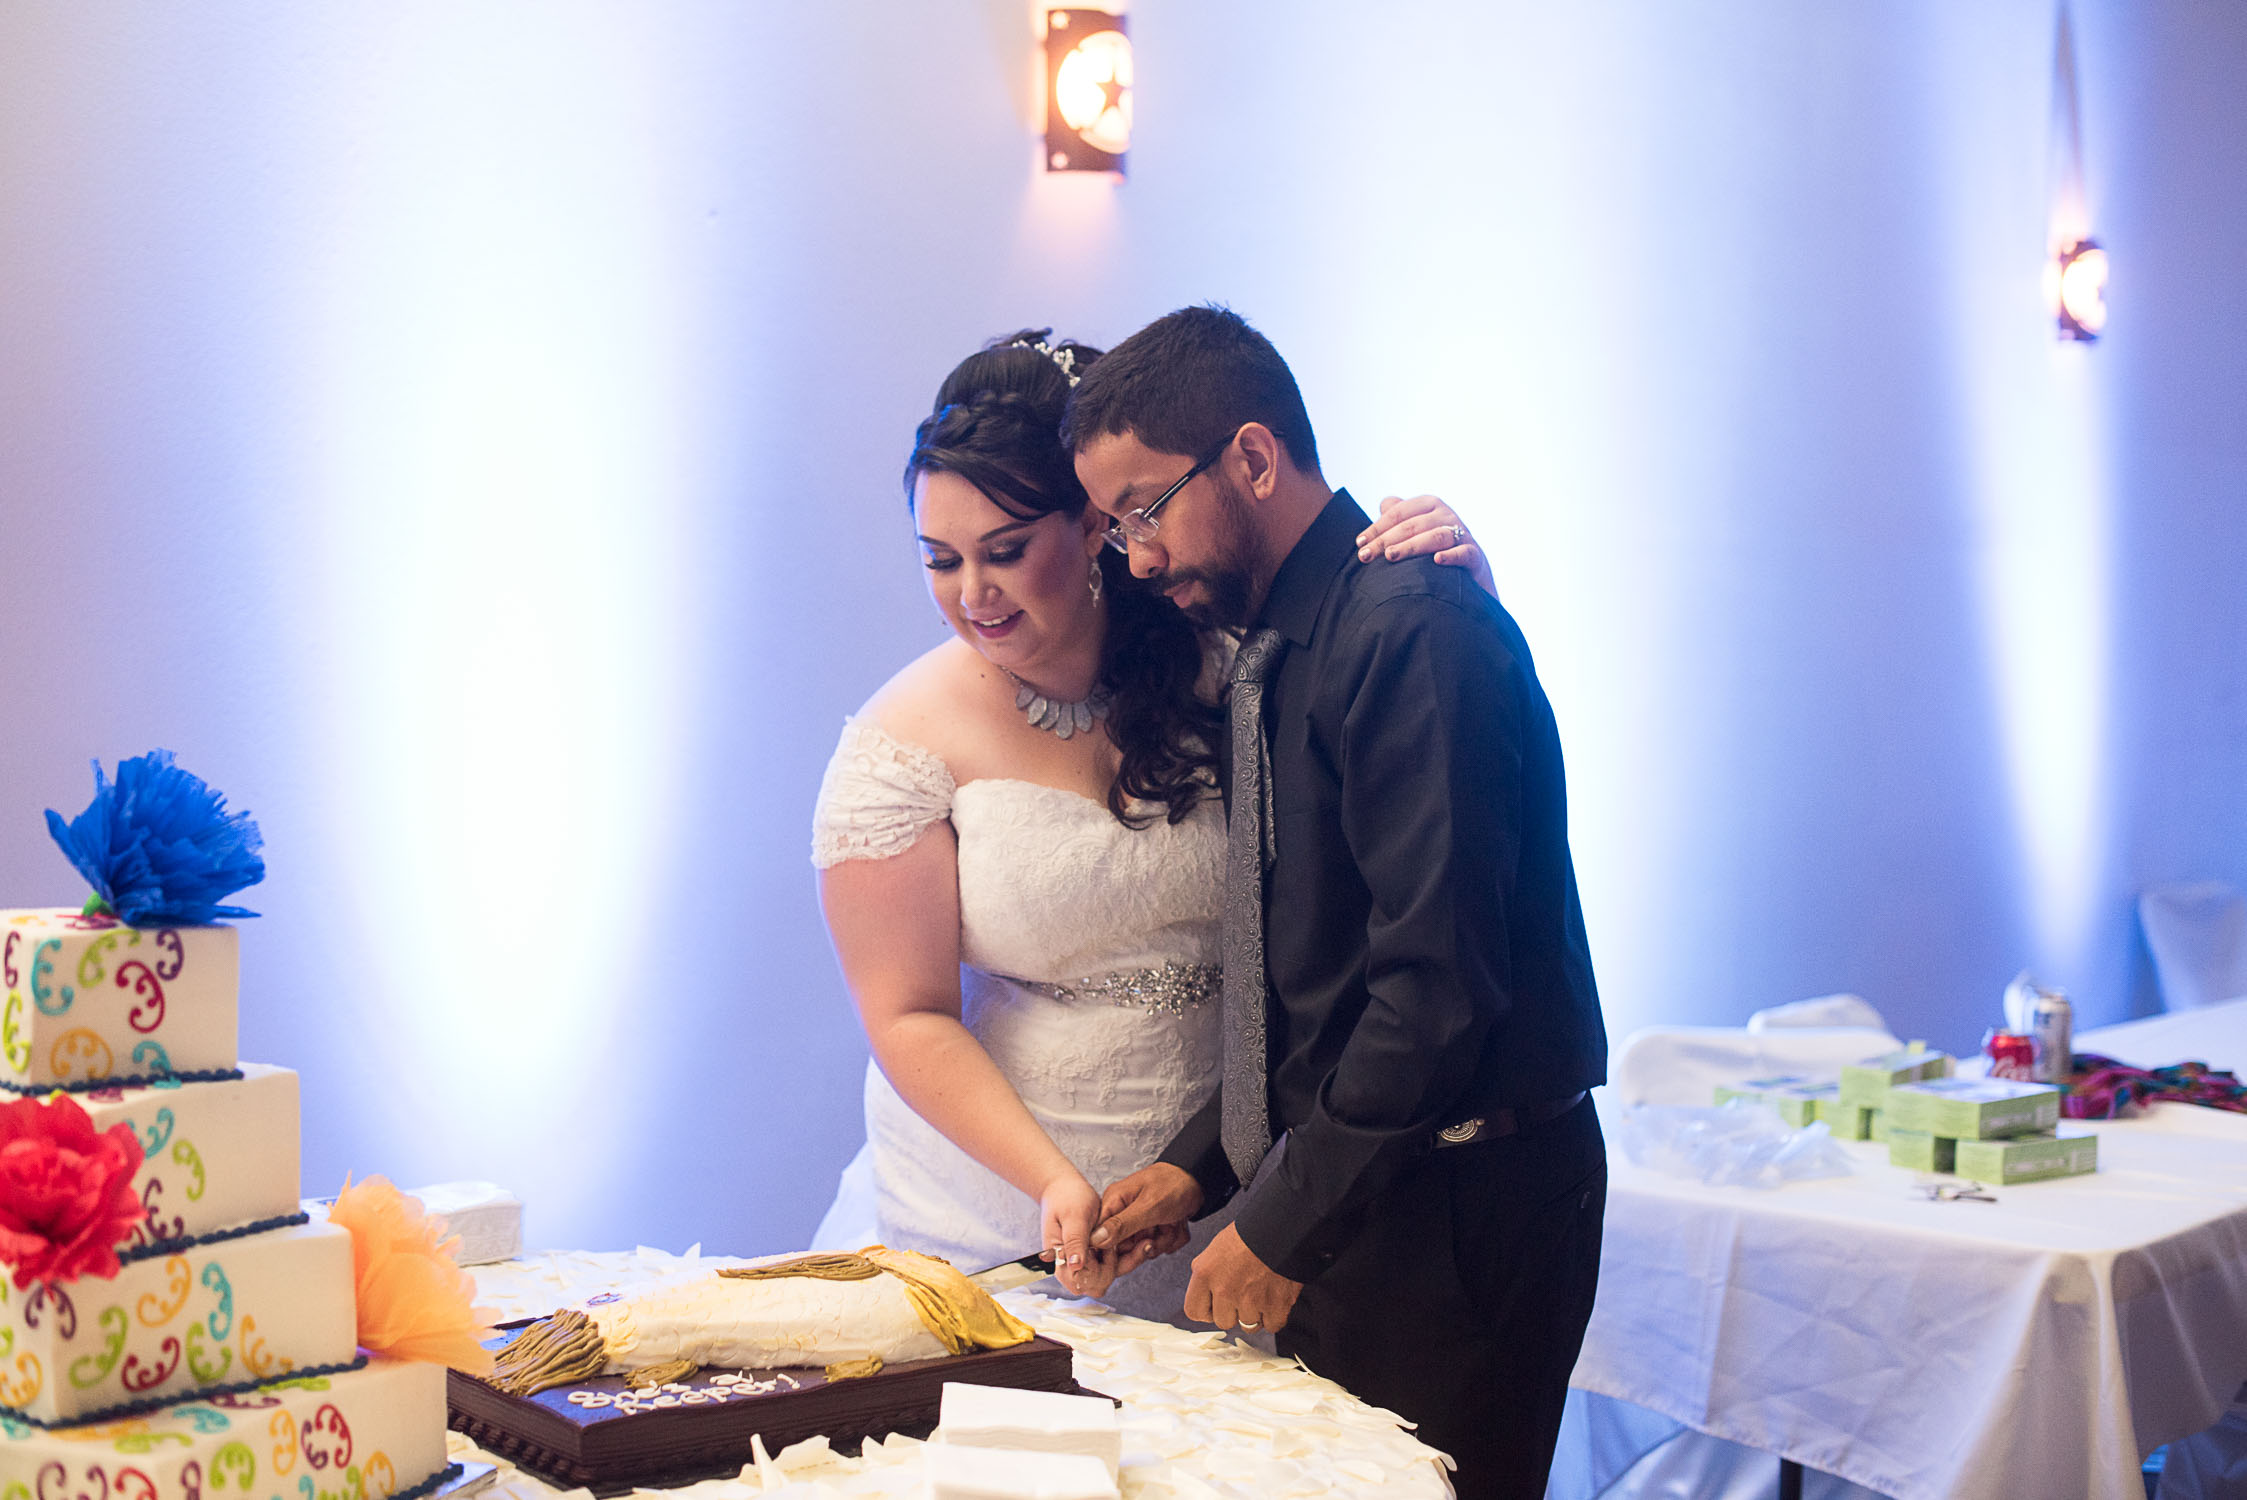 Leal Wedding Mira Visu Photography-185.jpg